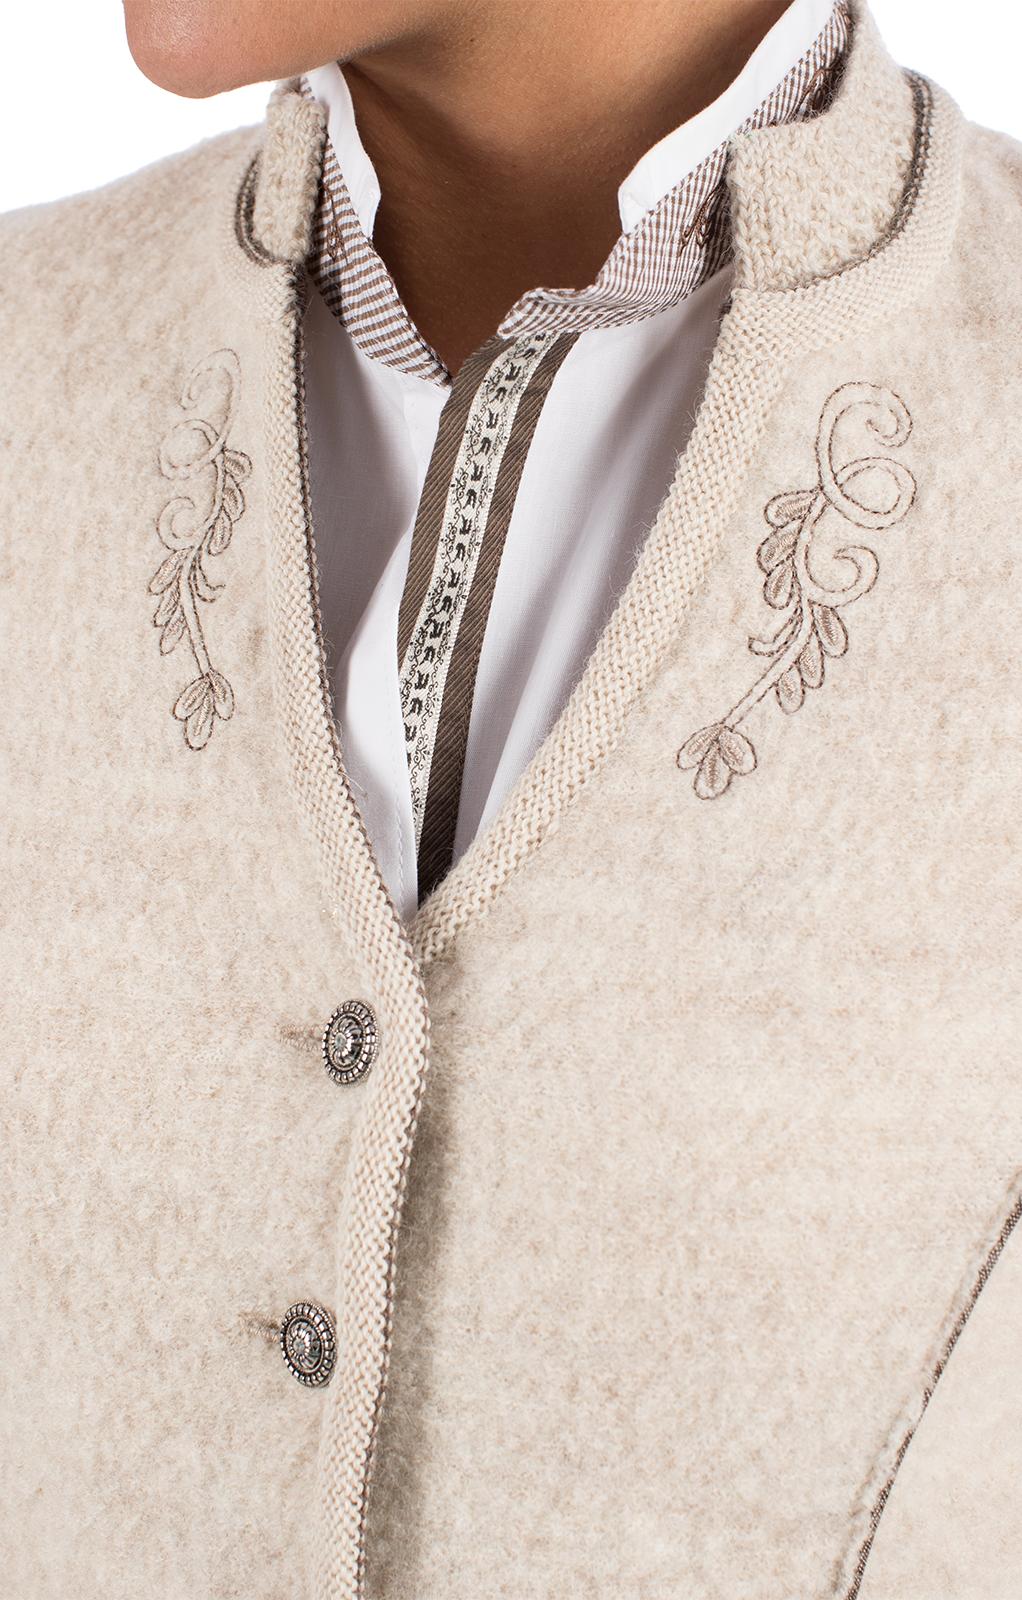 weitere Bilder von Giacca da passeggio per giacche tradizionali KRIEMHILD WJ natura